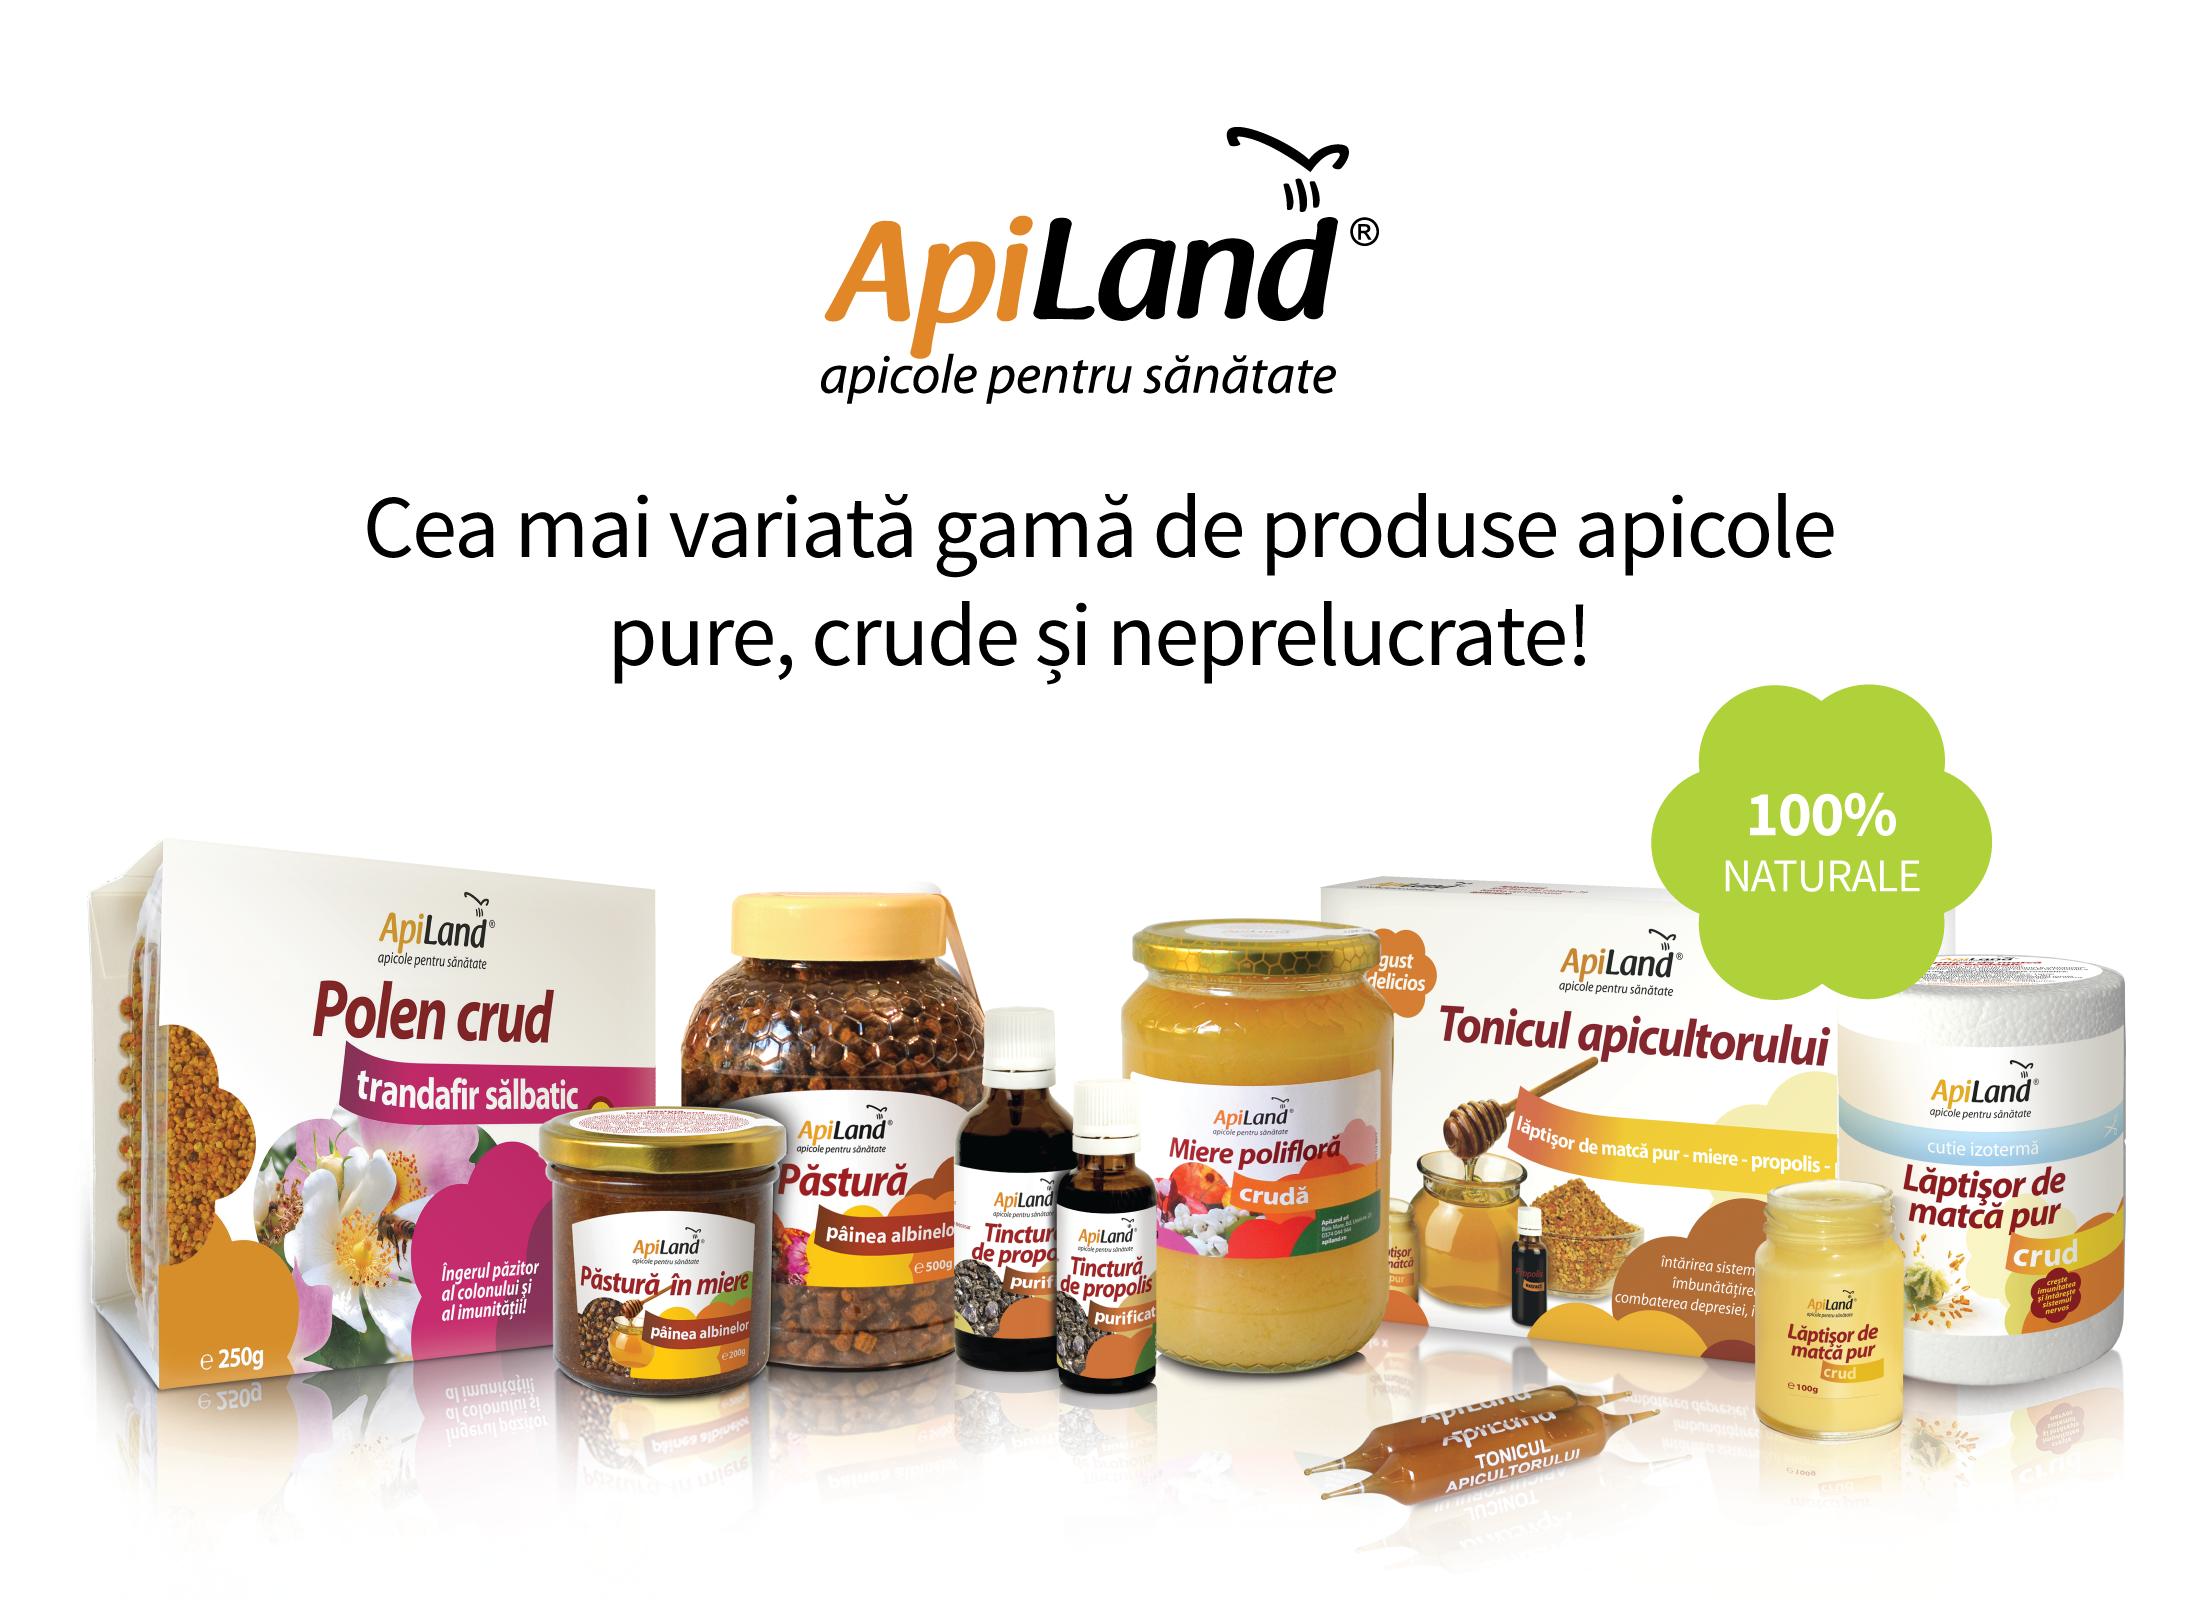 apiland_newsletter_2.png